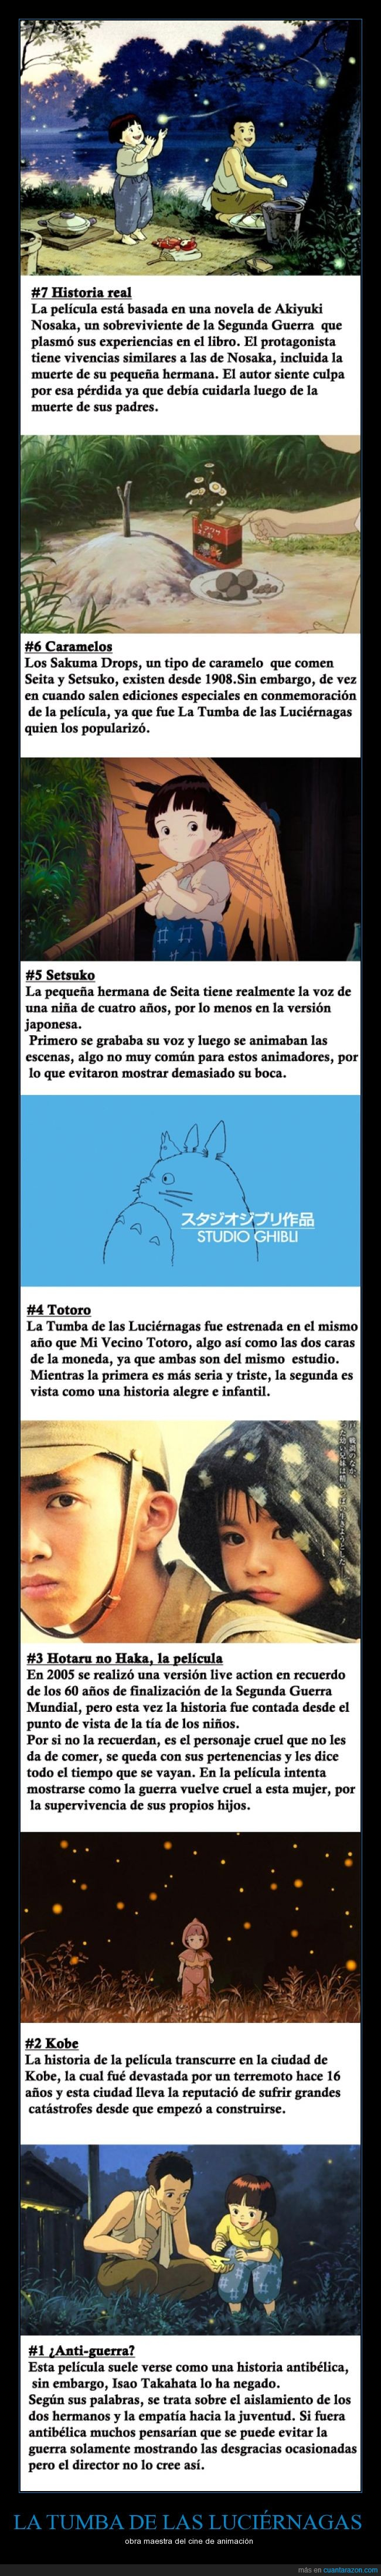 Ghibli,hotaru no haka,La tumba de las luciérnagas,Miyazaki